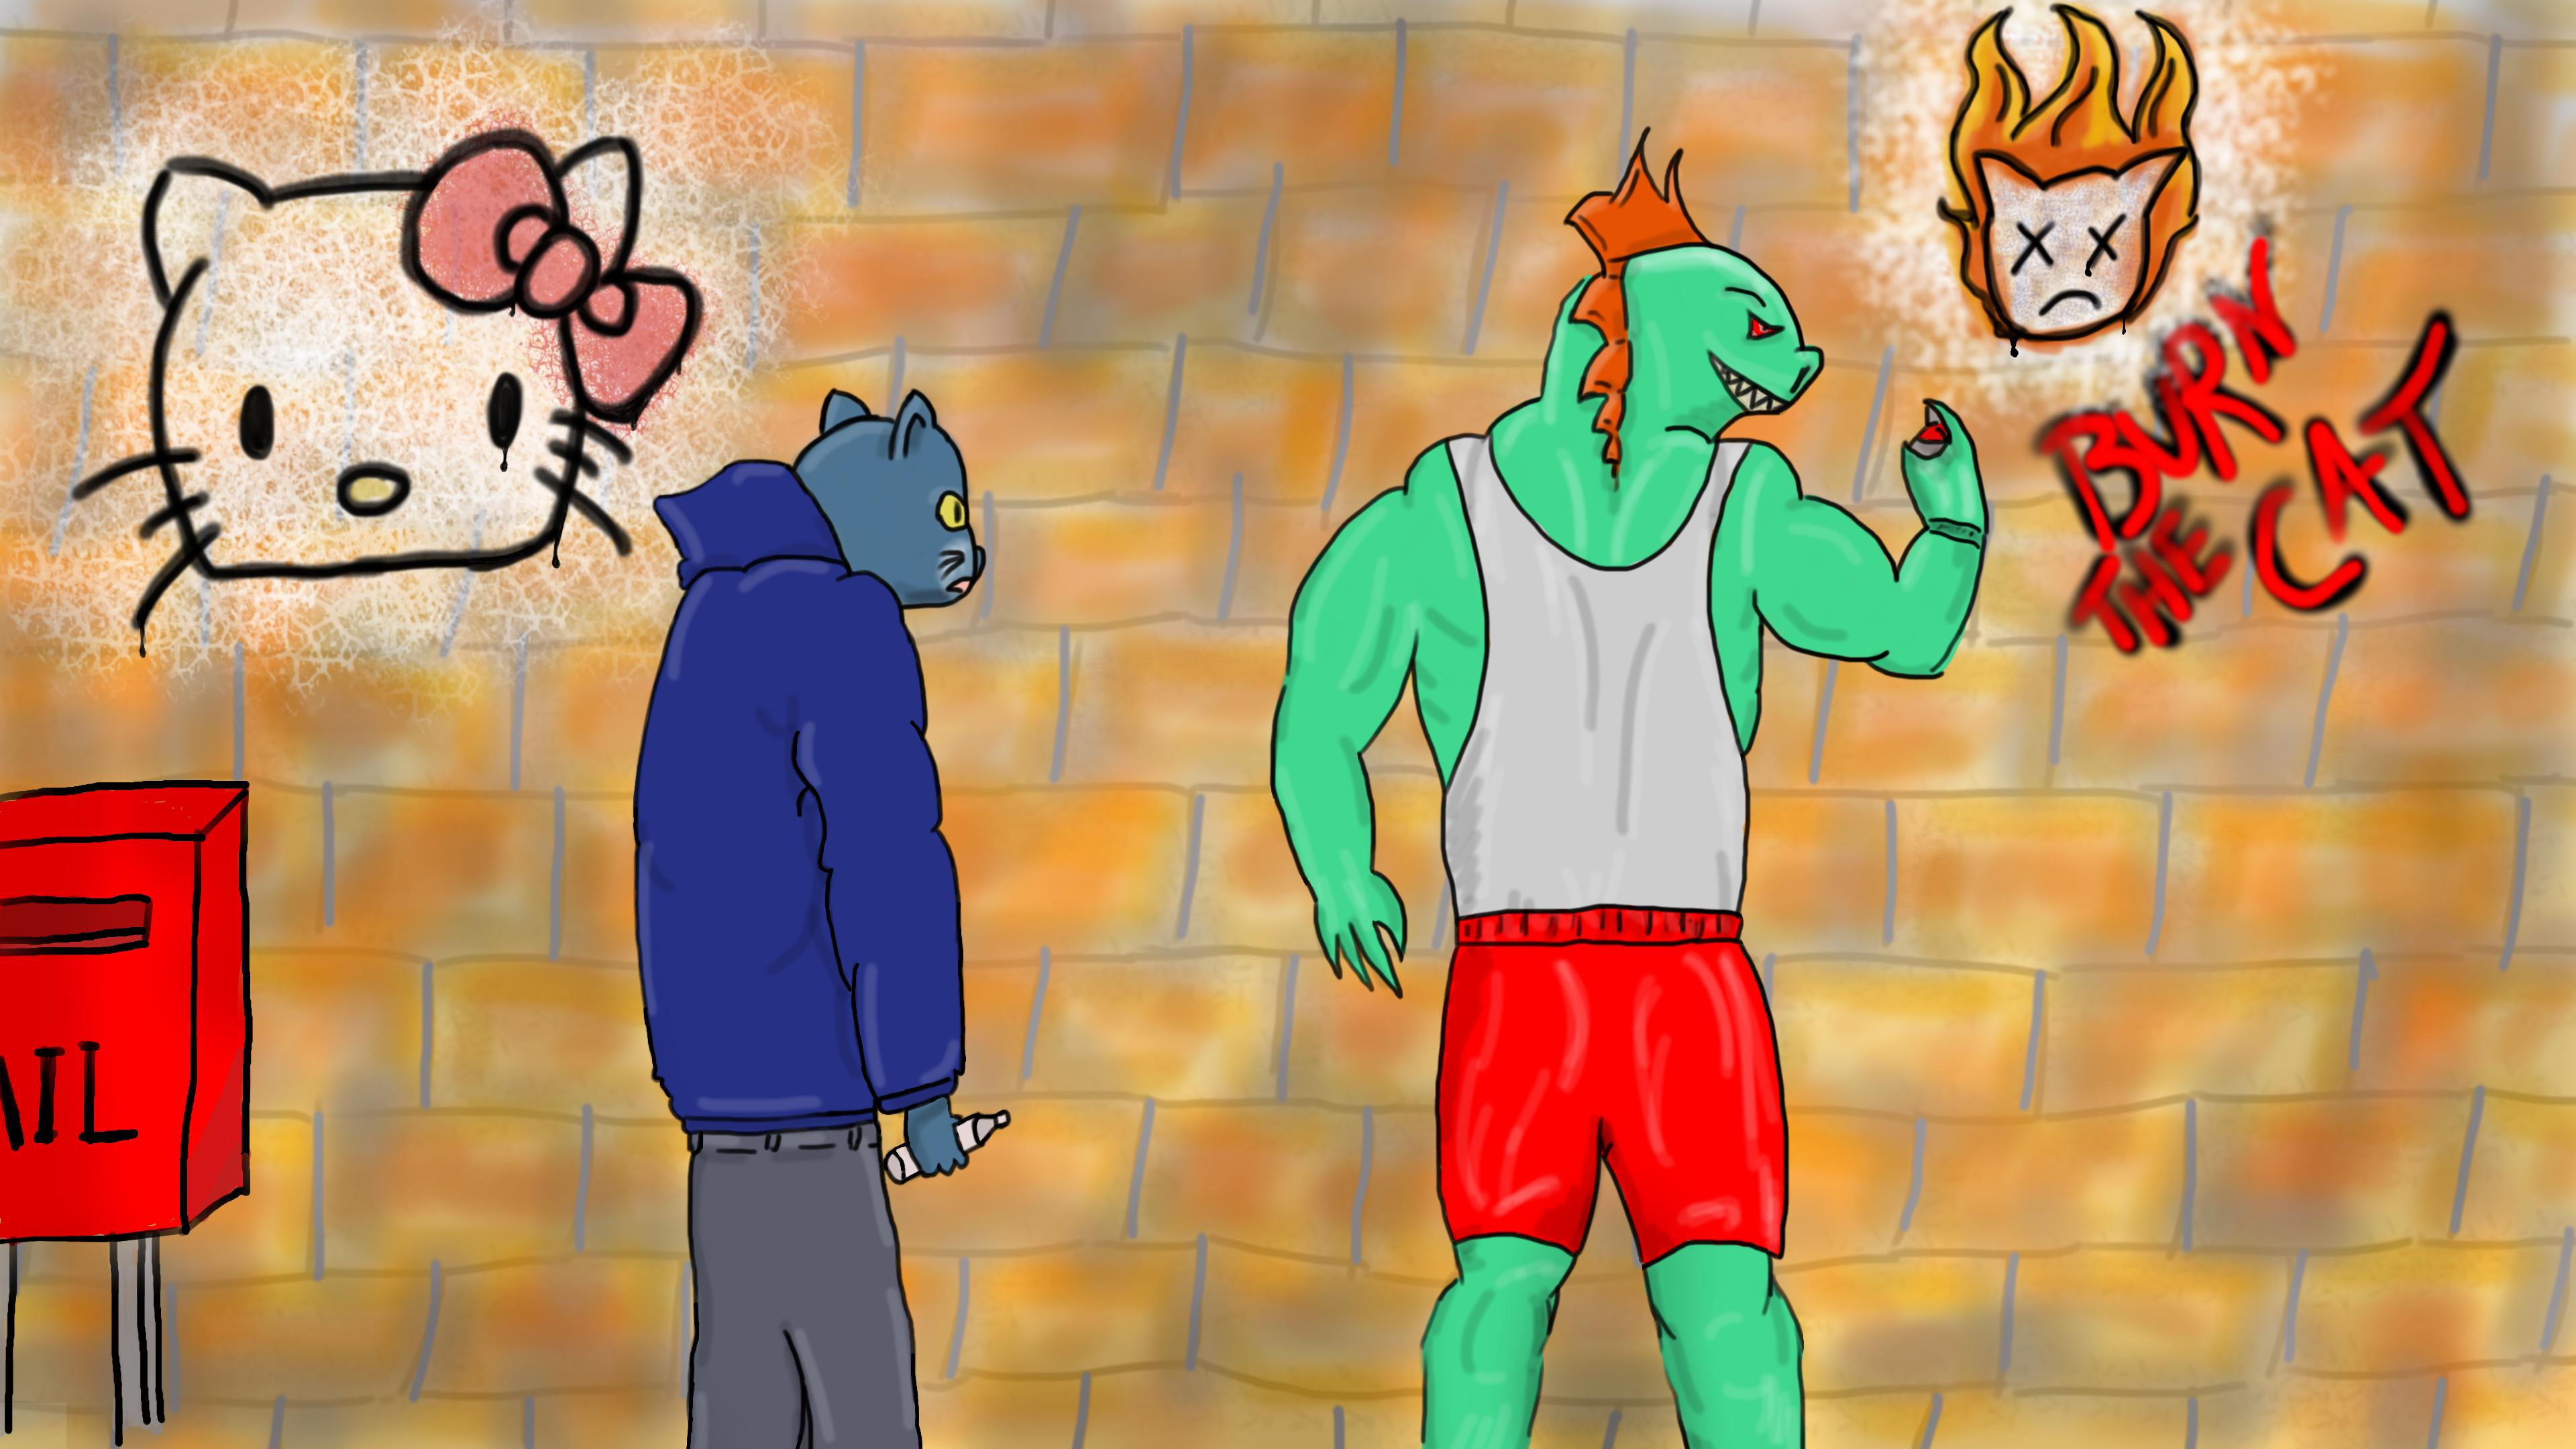 Dragons vs kittens Graffiti Battle